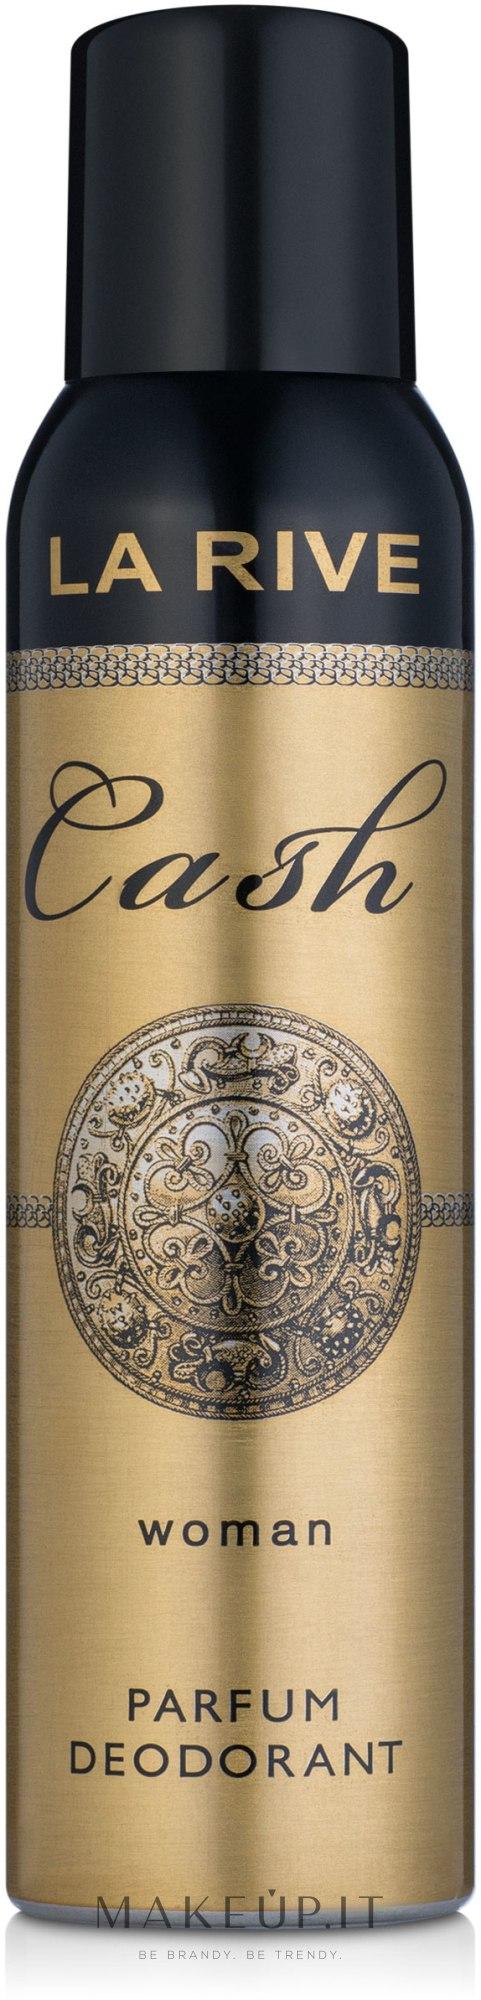 La Rive Cash Woman - Deodorante spray — foto 150 ml